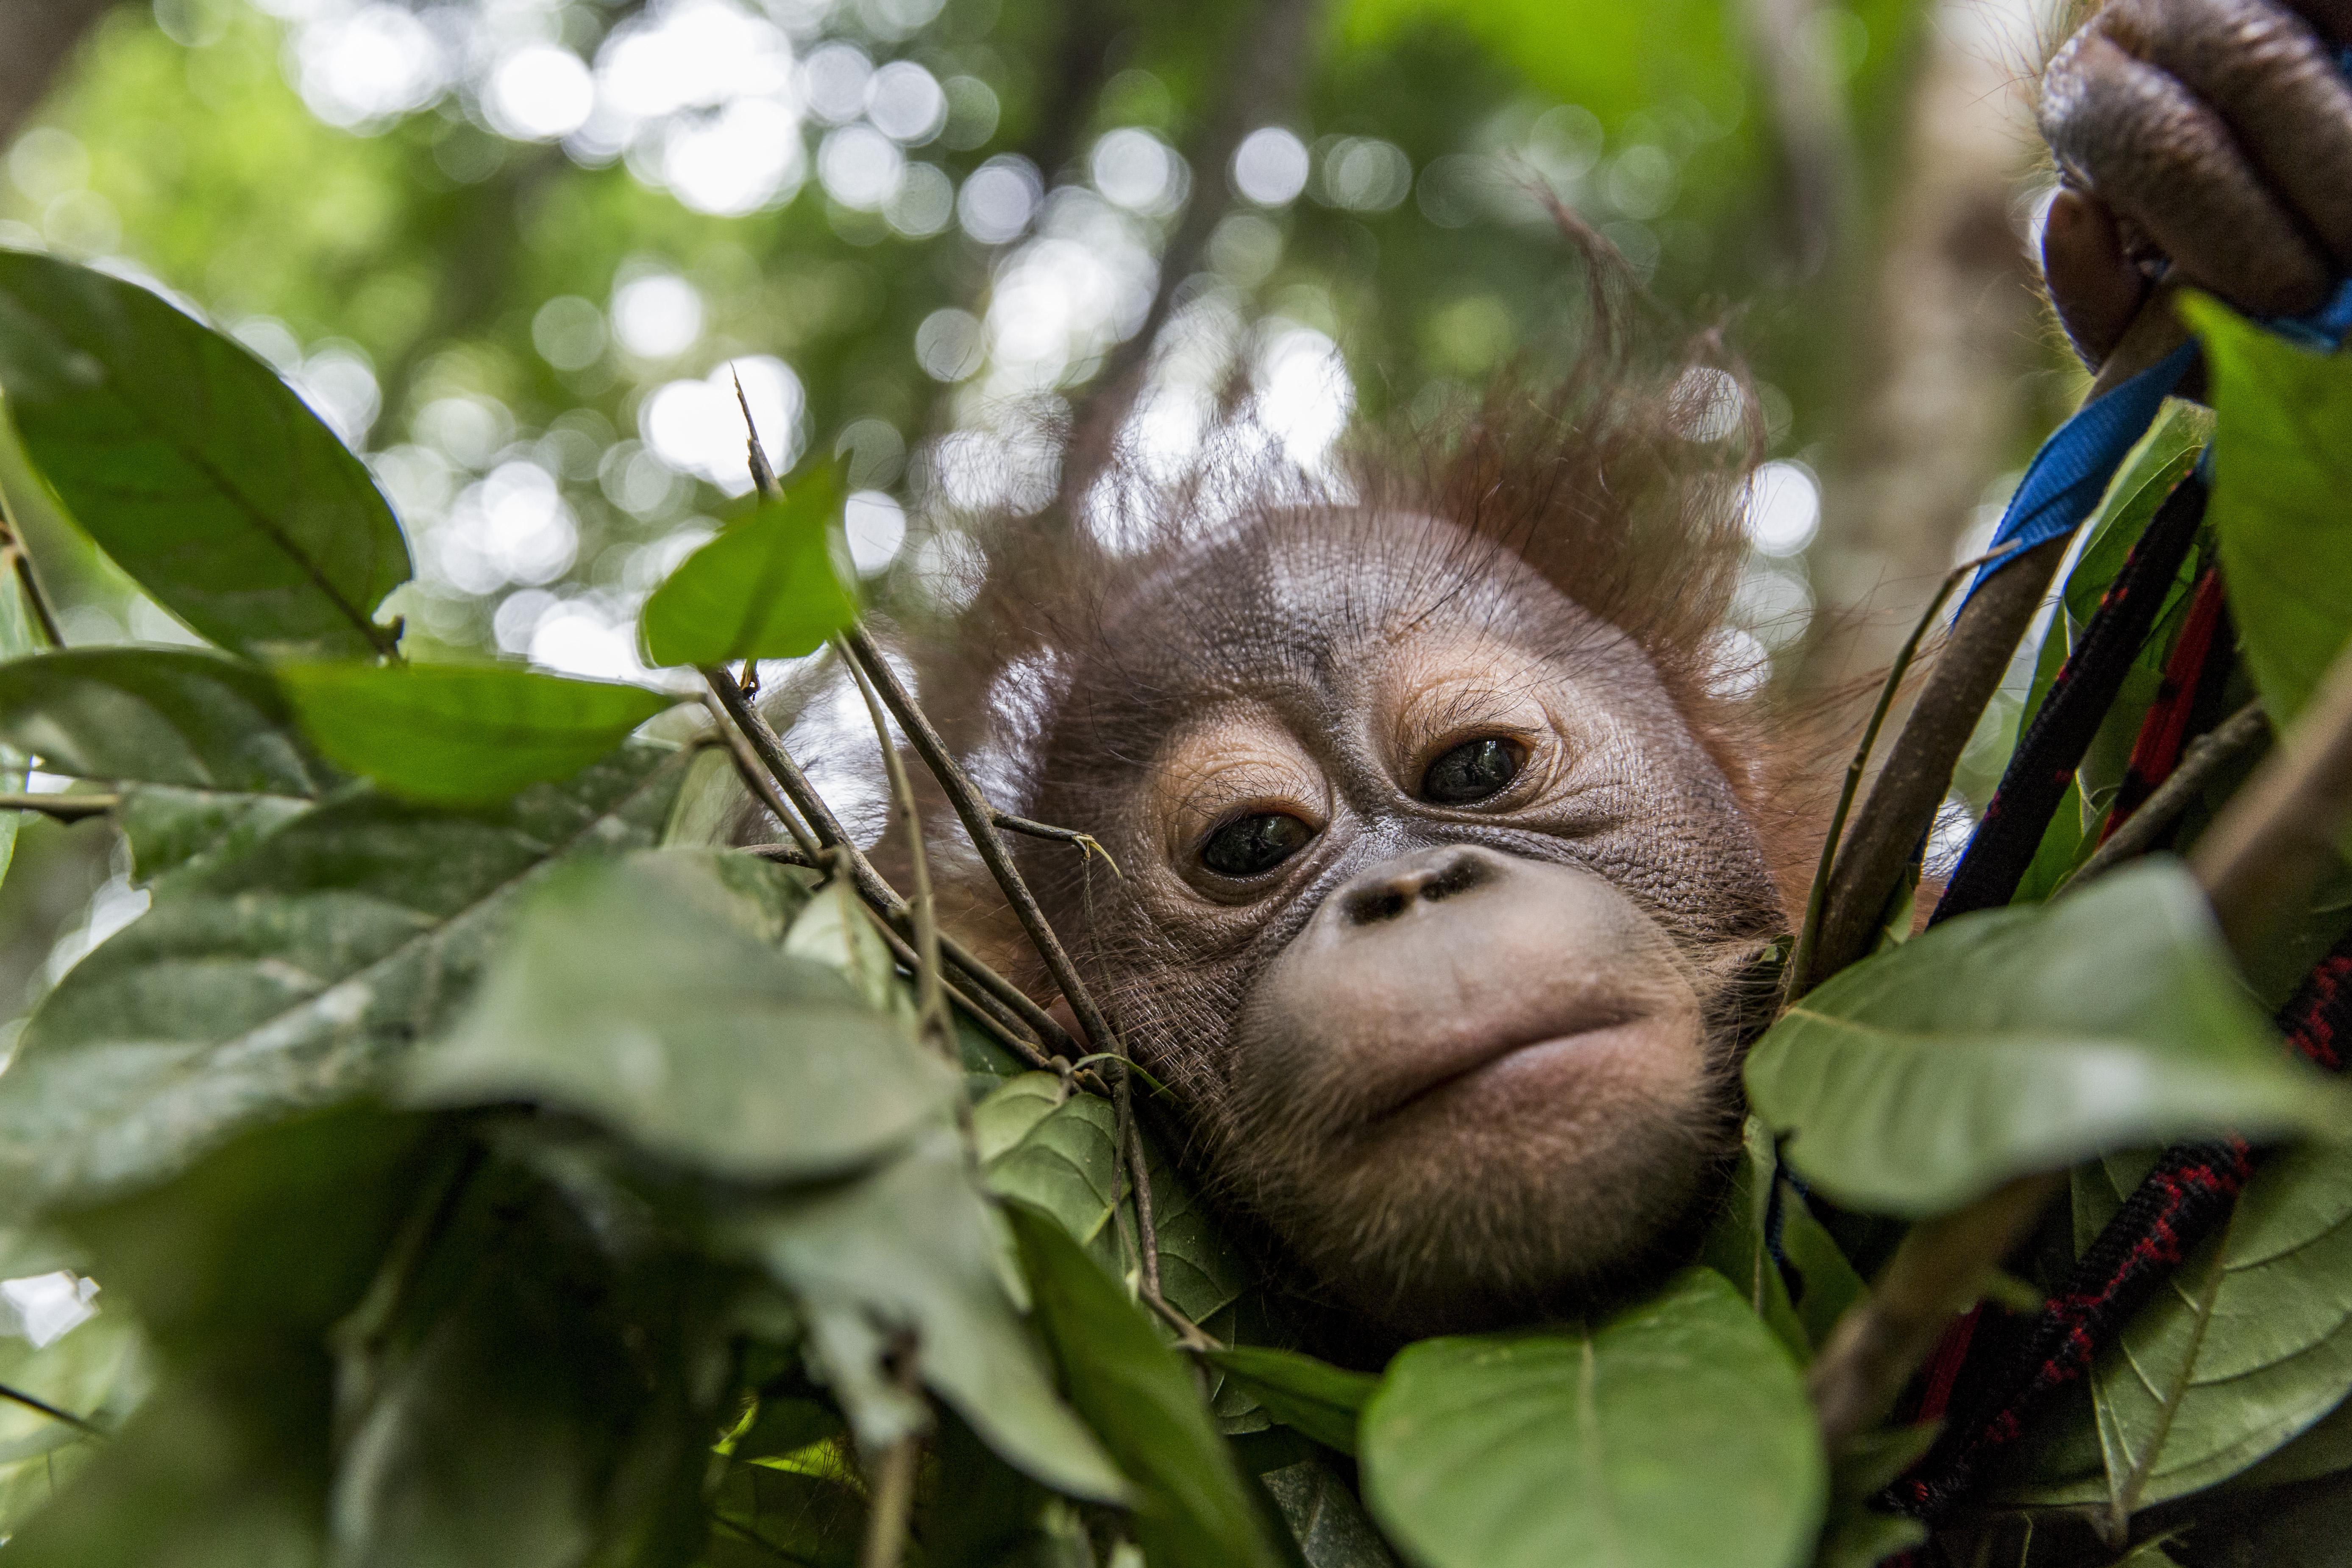 Orangutan in the leaves